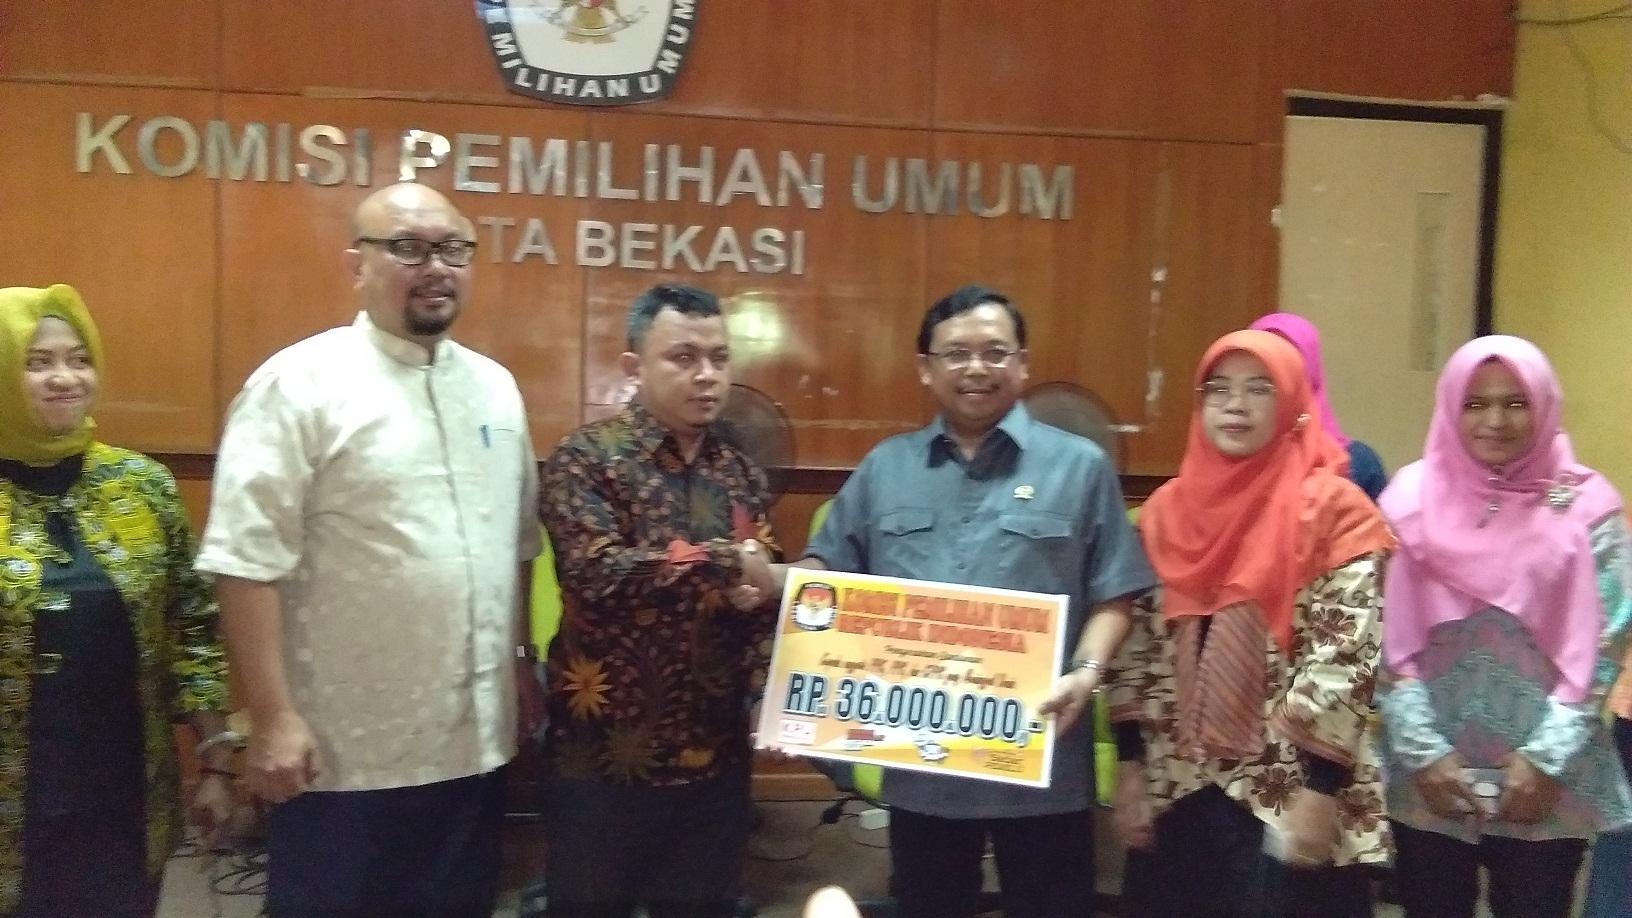 Rp 360 Juta dari KPU untuk 10 Ahli Waris PPS dan KPPS yang Meninggal di Kota Bekasi